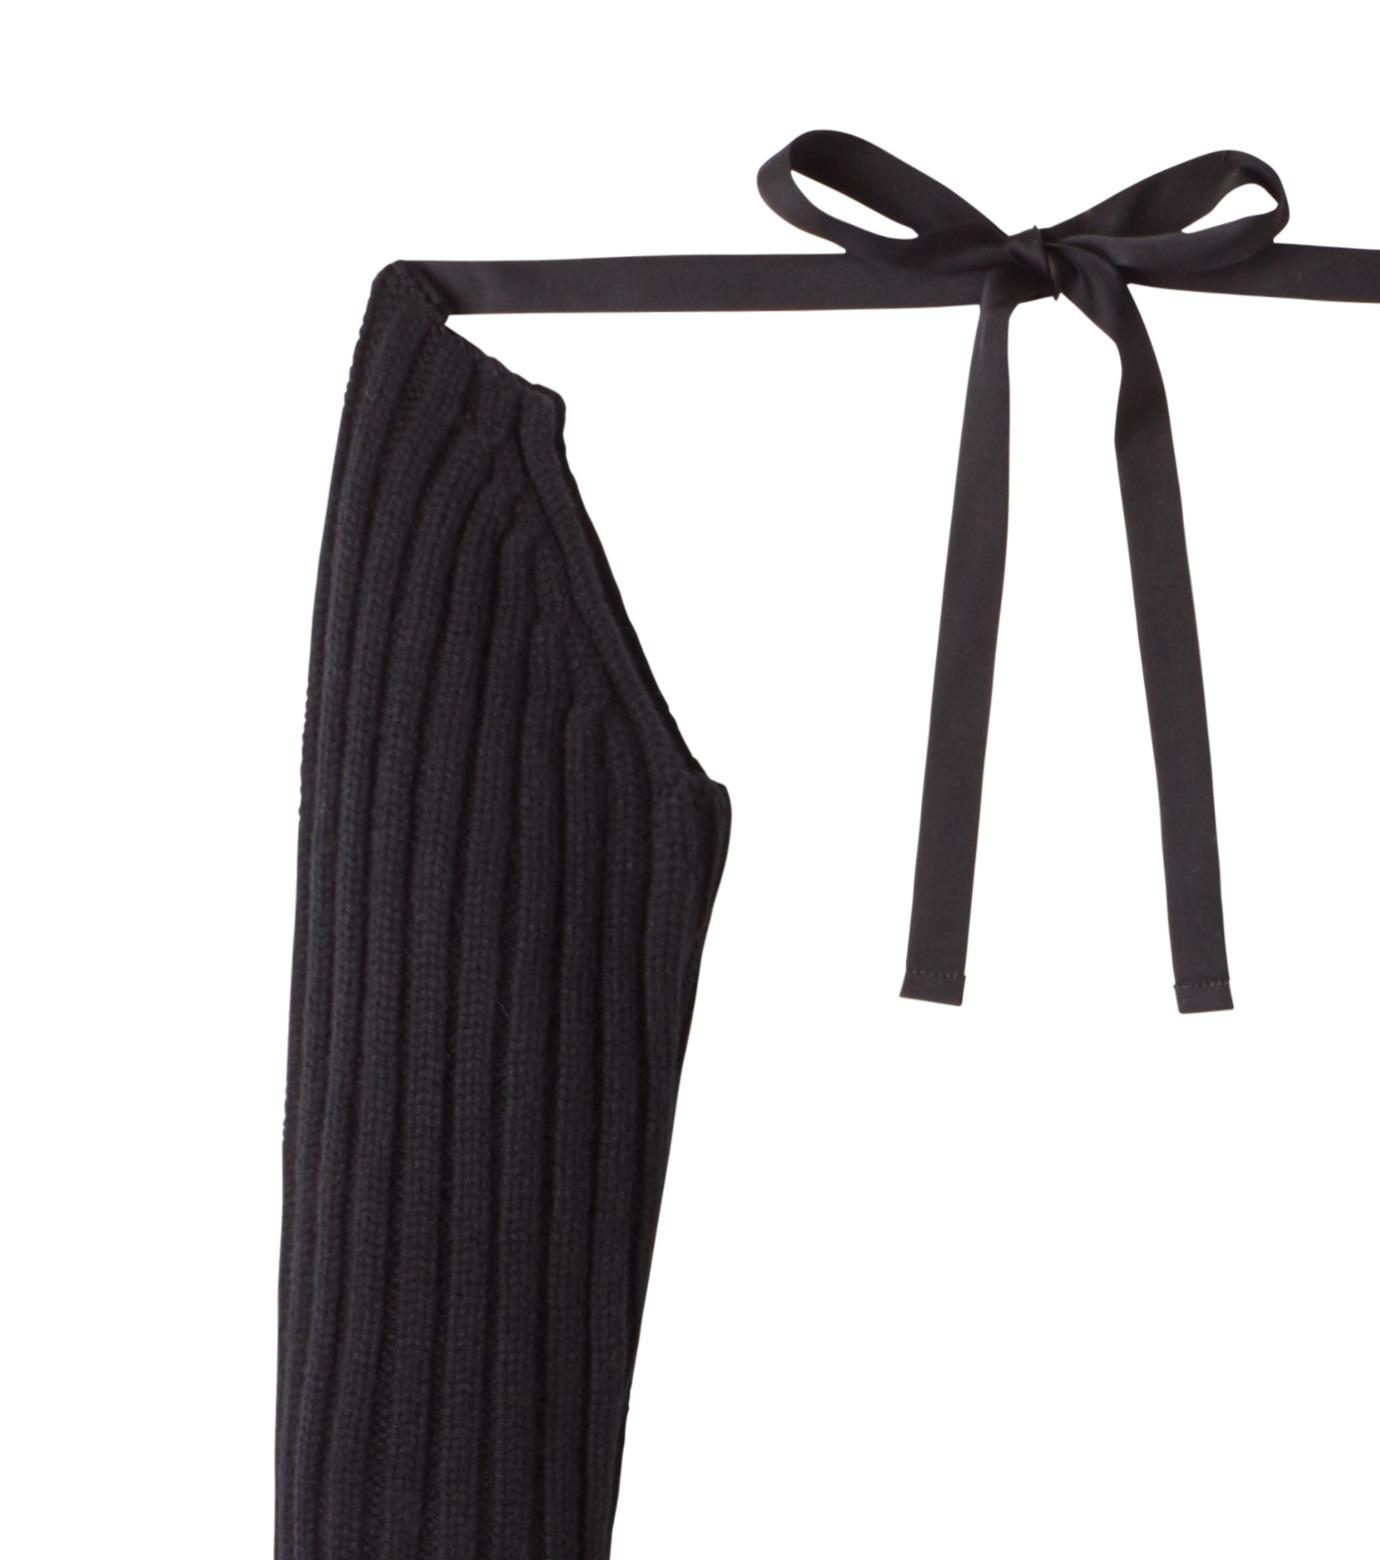 DRESSEDUNDRESSED(ドレスドアンドレスド)のKnit Sleeve-BLACK(アクセサリー/accessory)-DUW16281-13 拡大詳細画像2